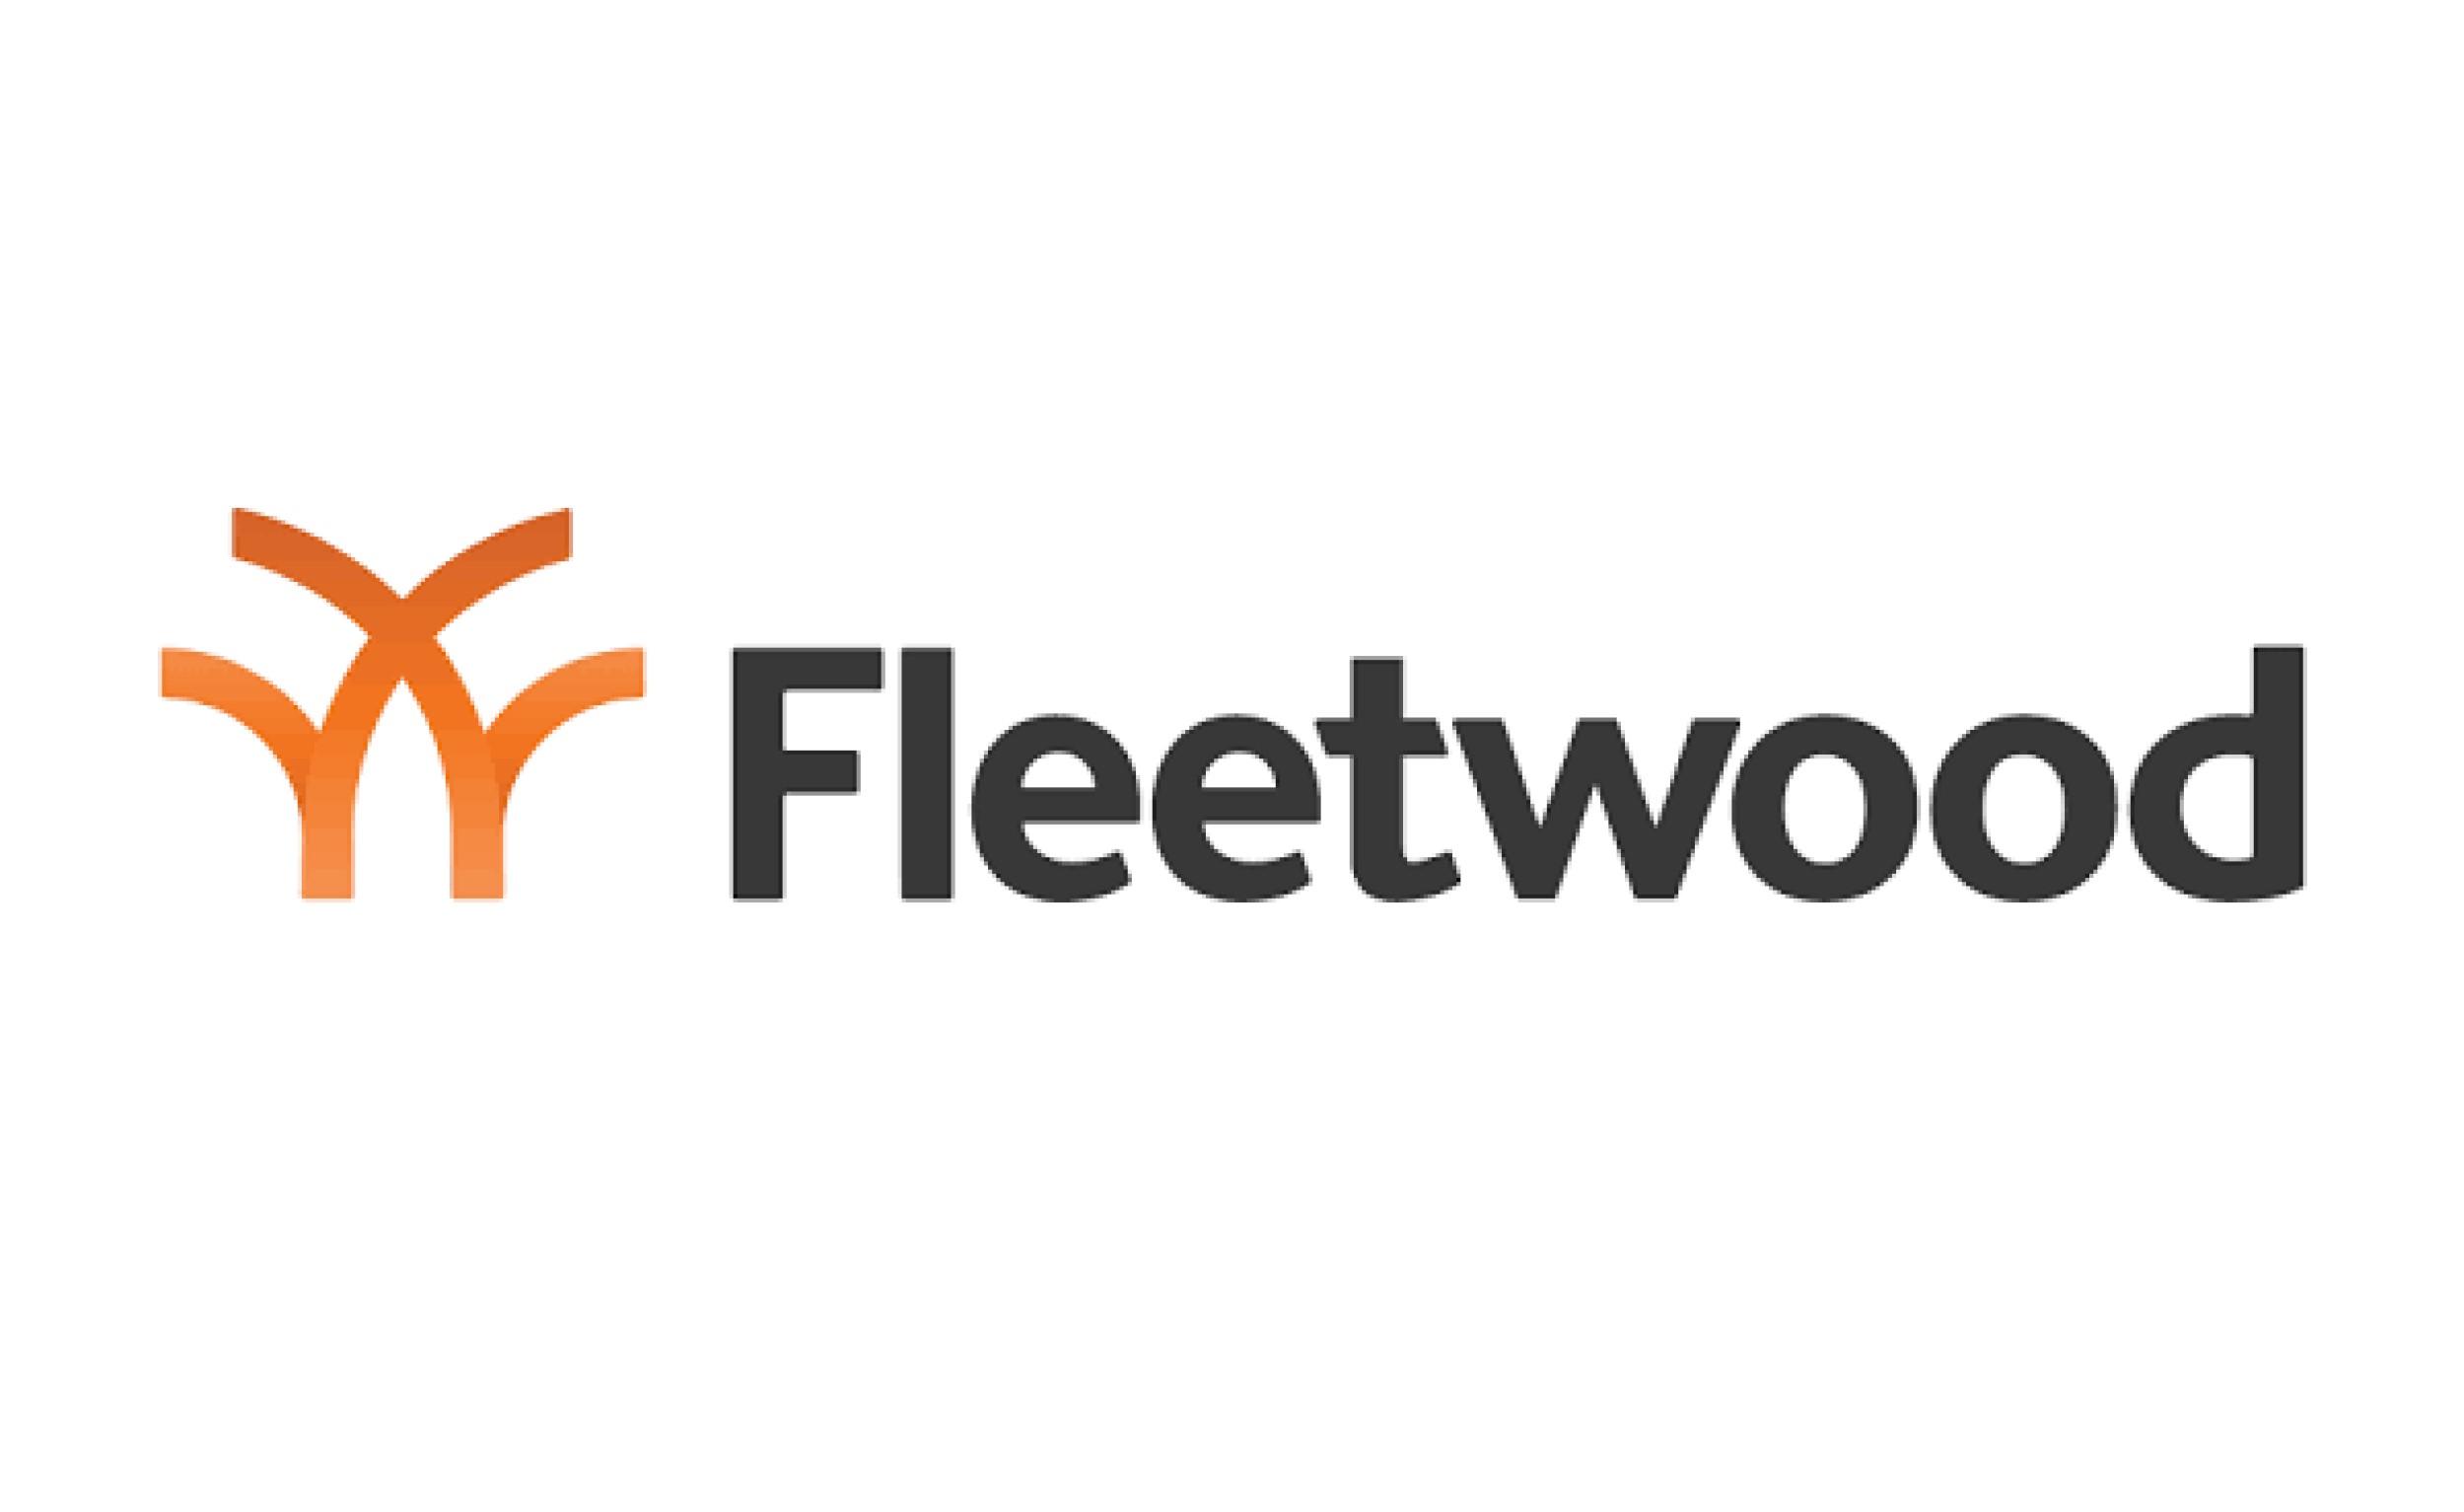 Fleetwood-1